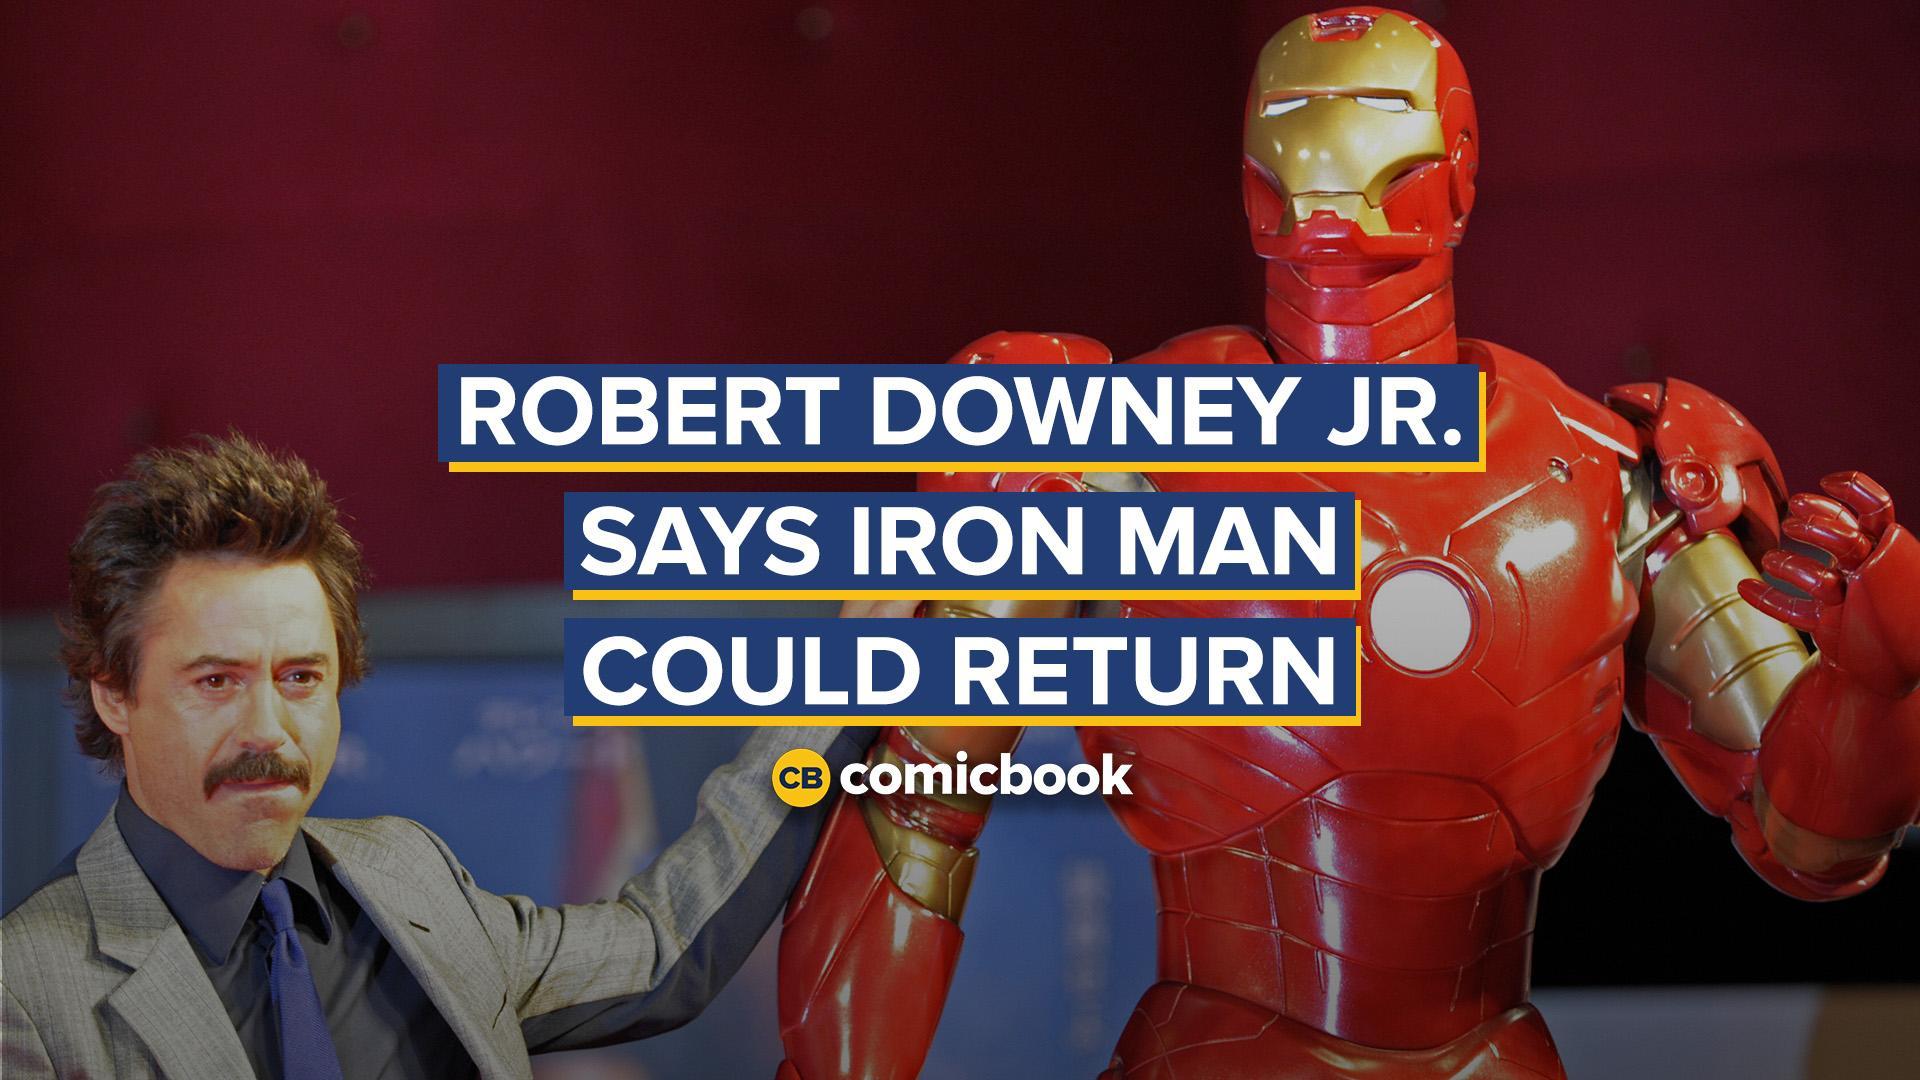 Robert Downey Jr. Says Iron Man Could Return screen capture